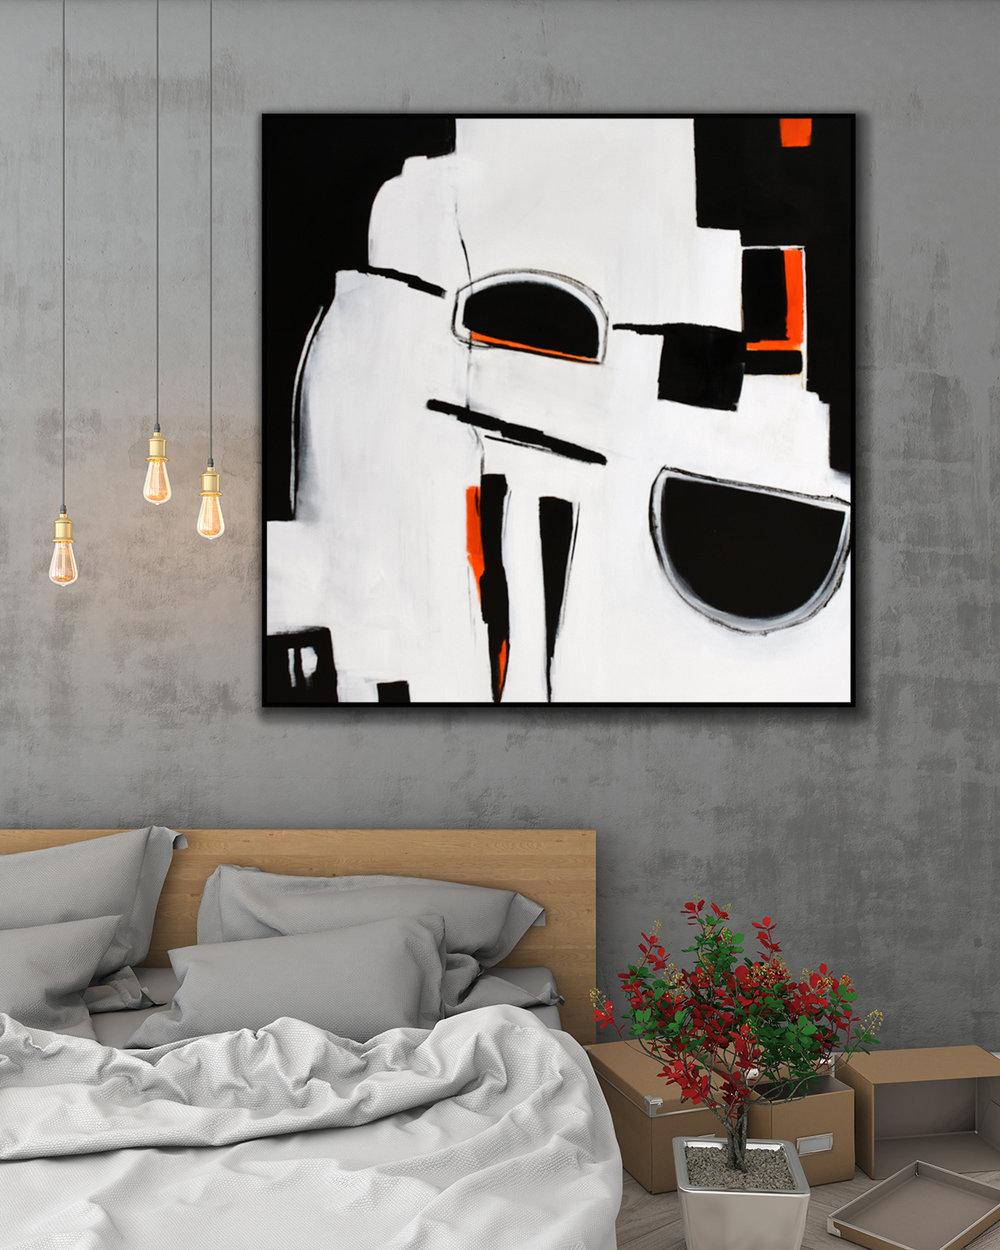 Original Large Abstract Art Painting On Canvas Black White Orange wall art Large Acrylic Painting On Canvas Minimalist Abstract Square Painting #ORG12 & Modern Art Home Decor